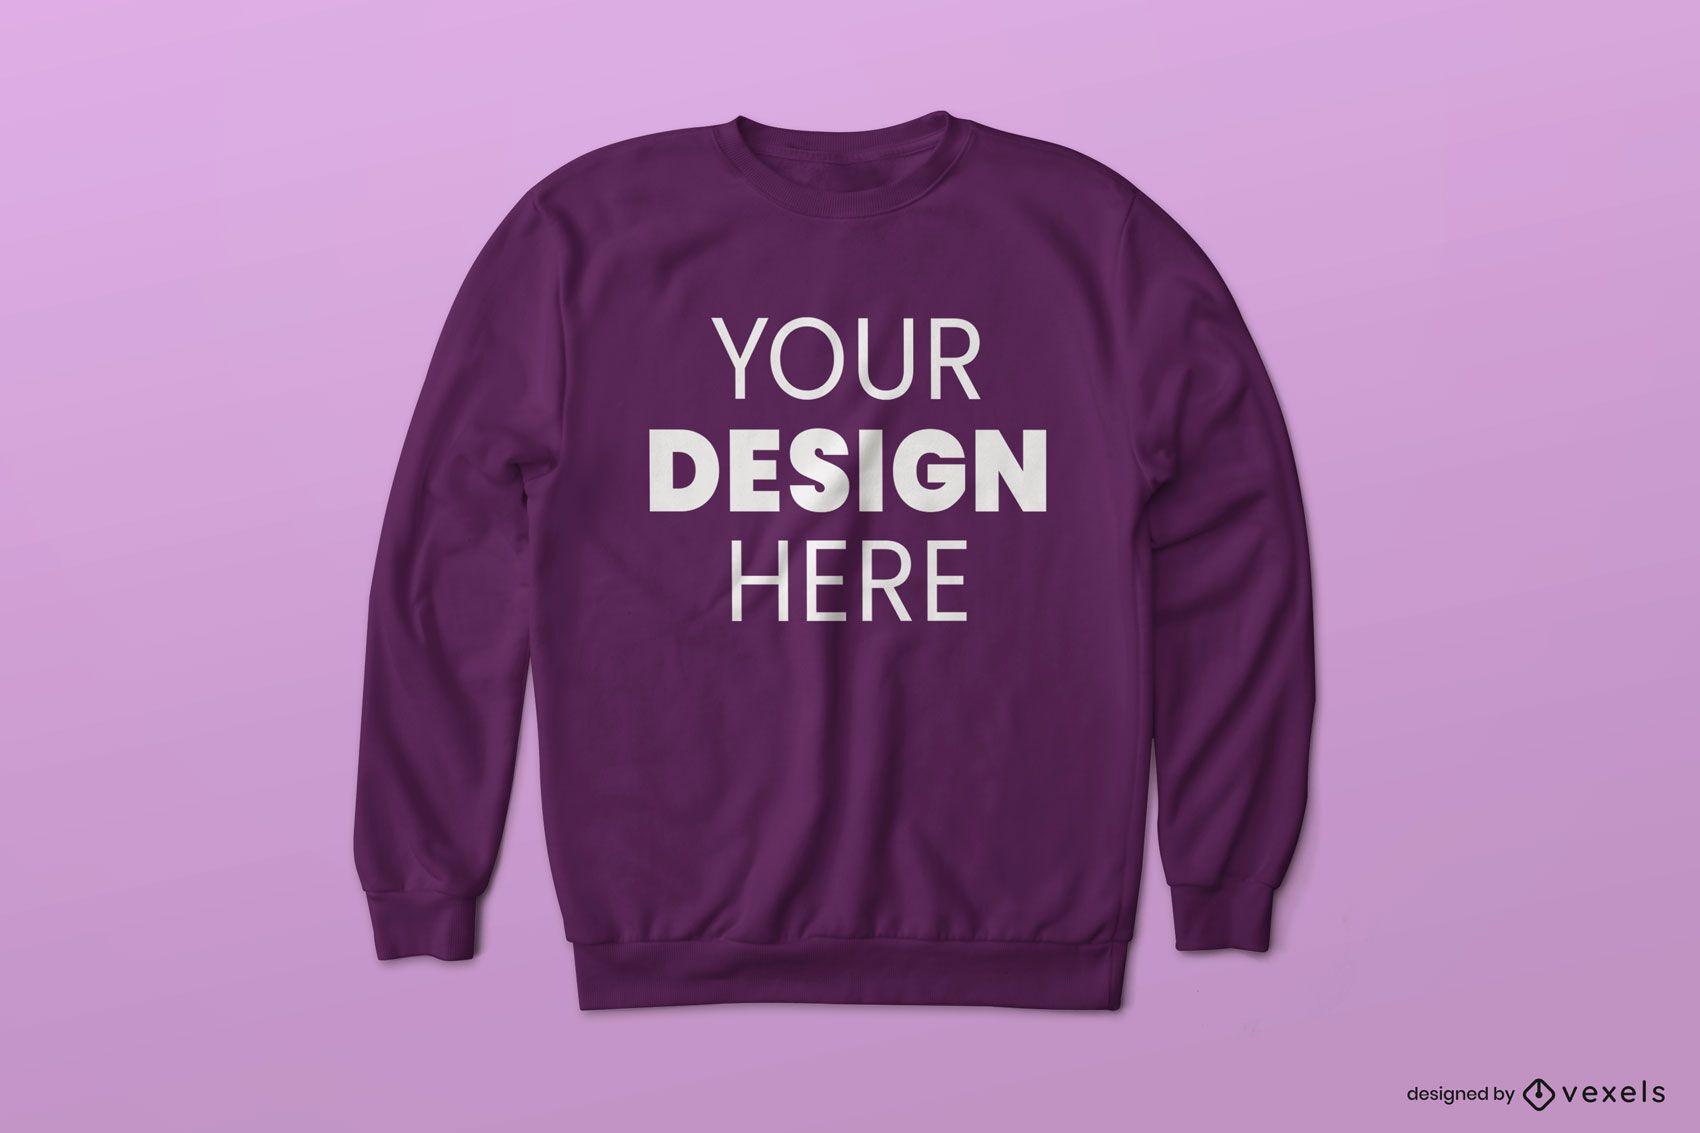 Simple sweatshirt mockup design